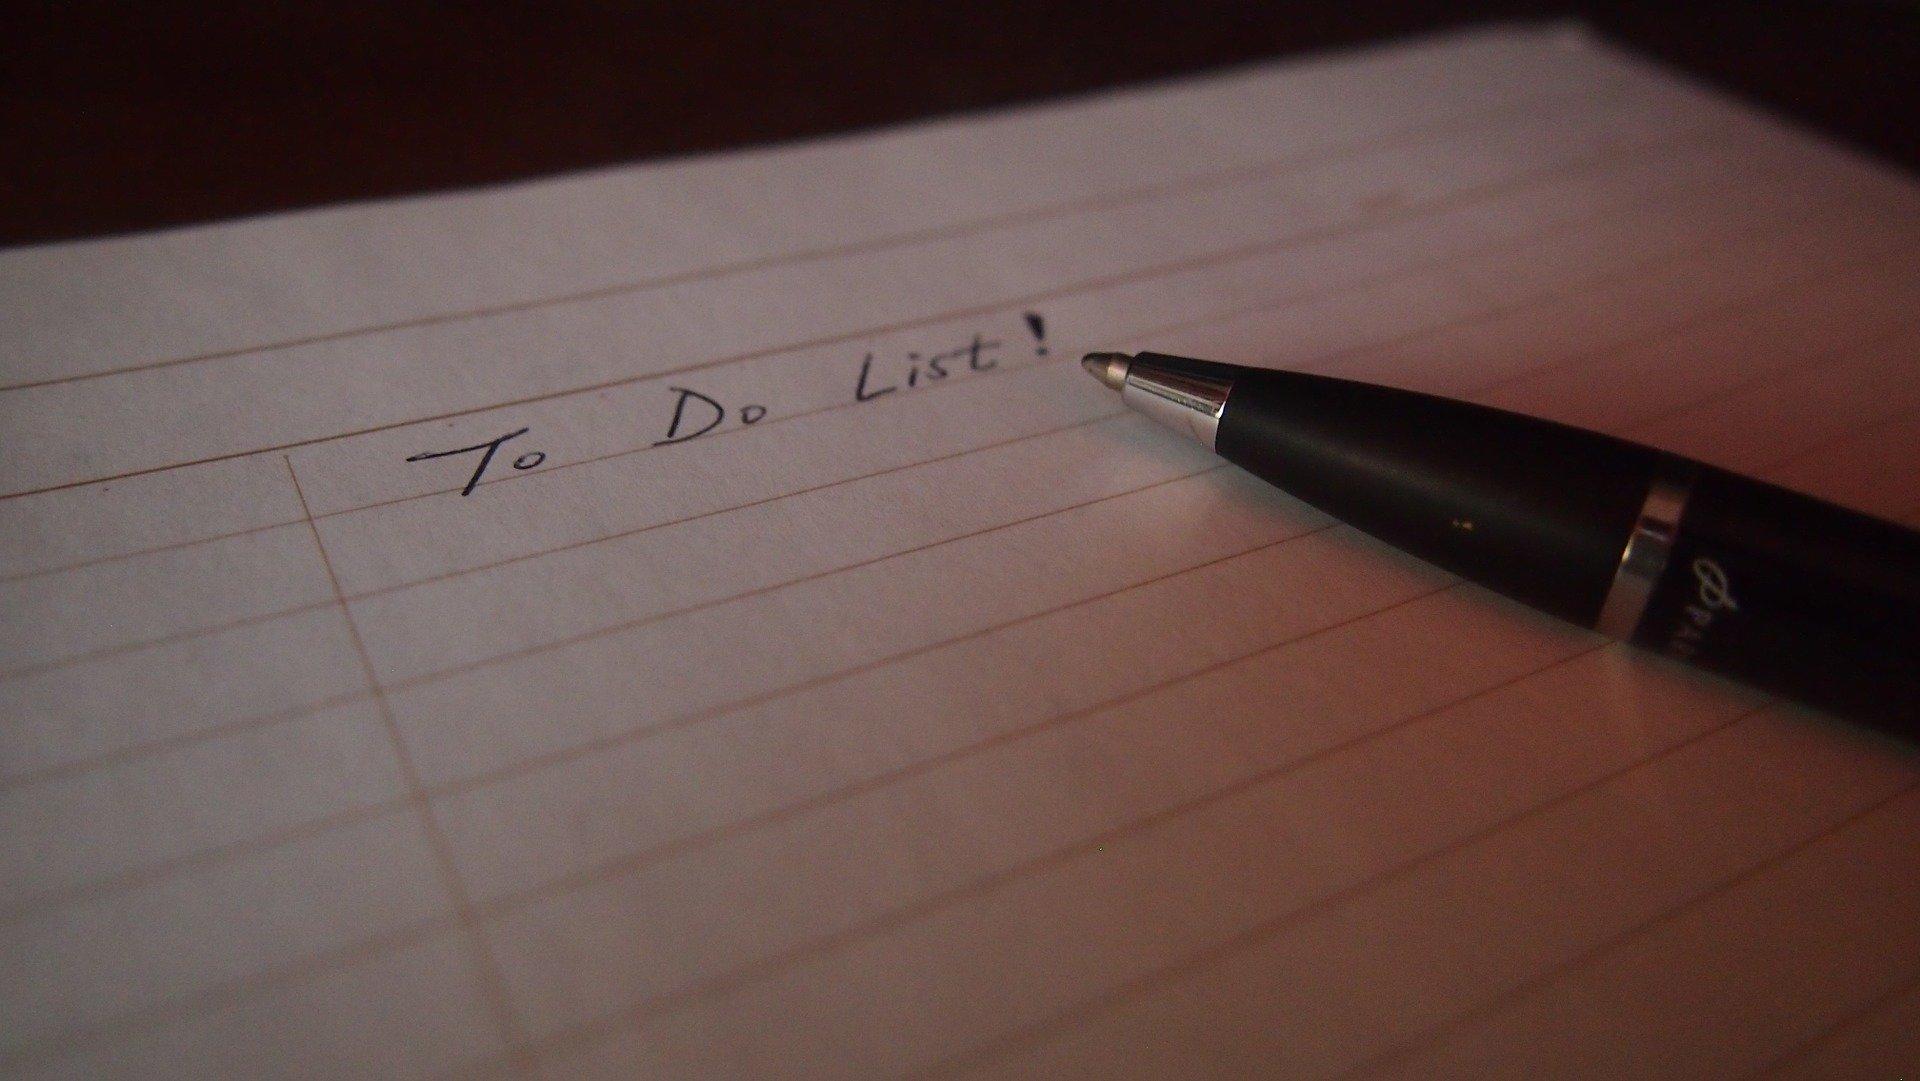 start a task list today